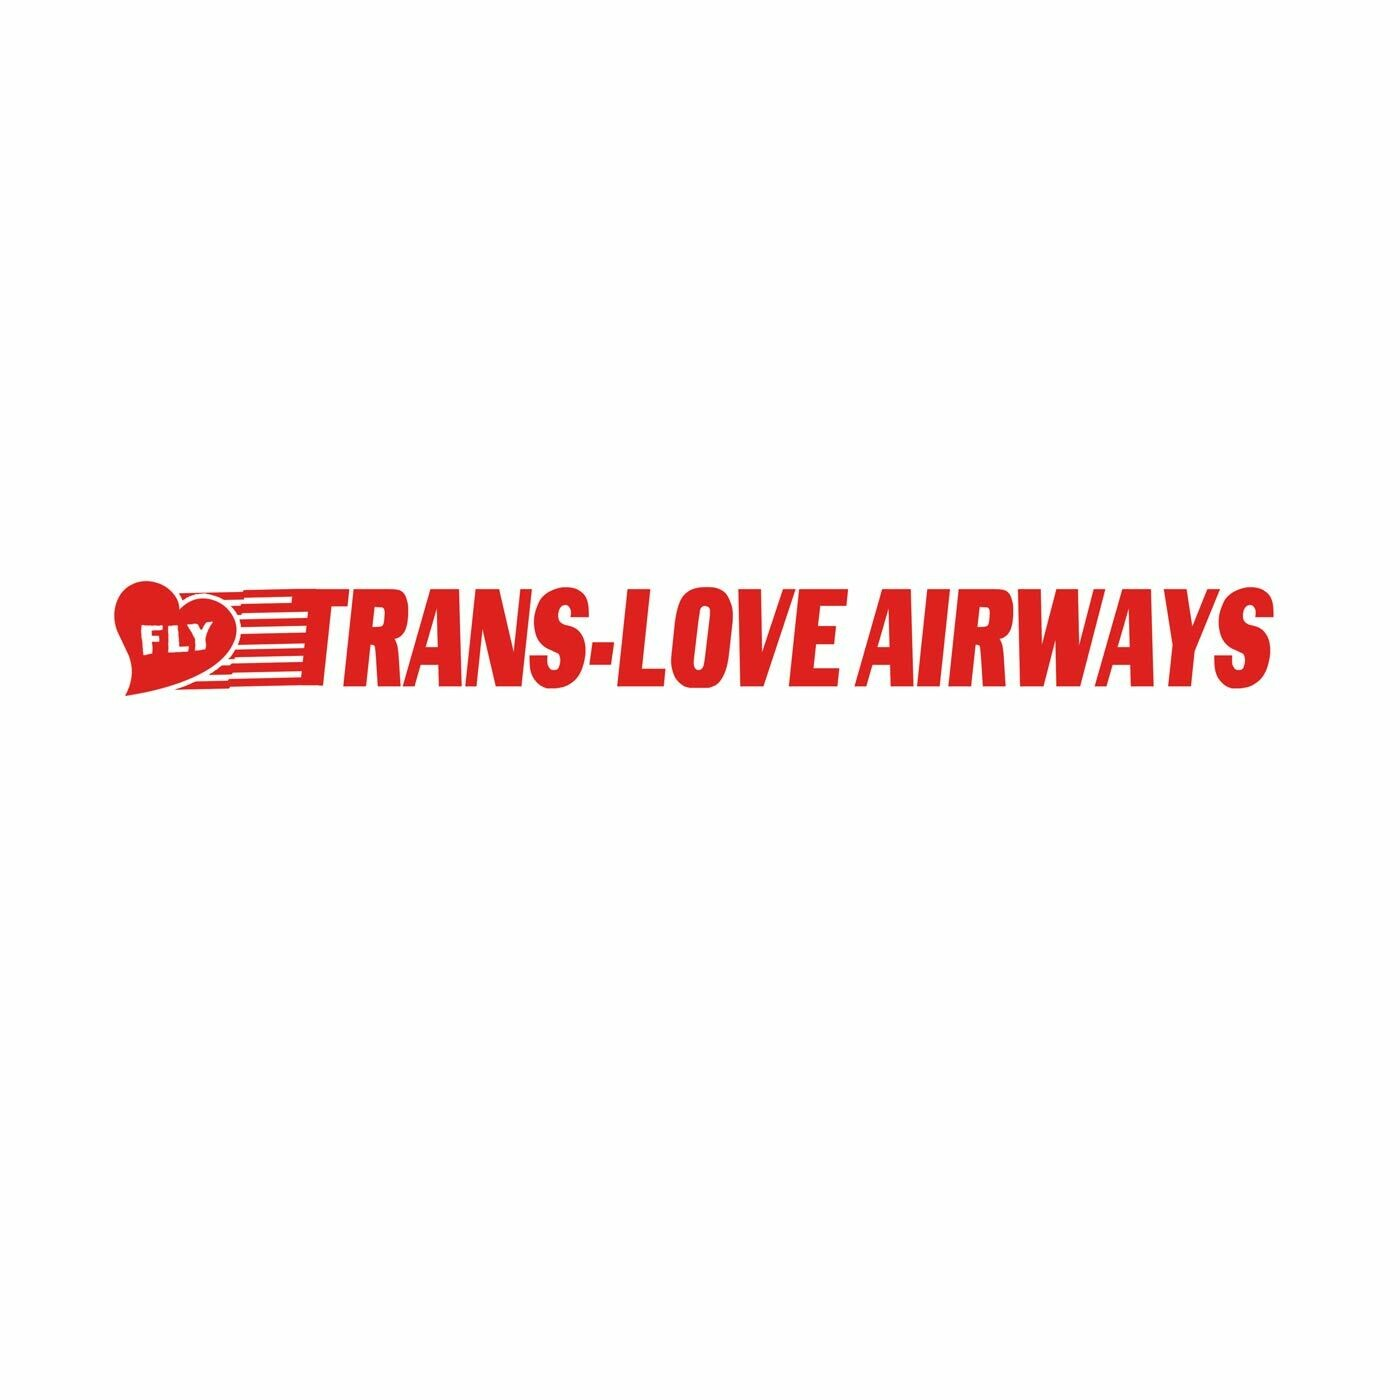 TRANS-LOVE AIRWAYS shirt